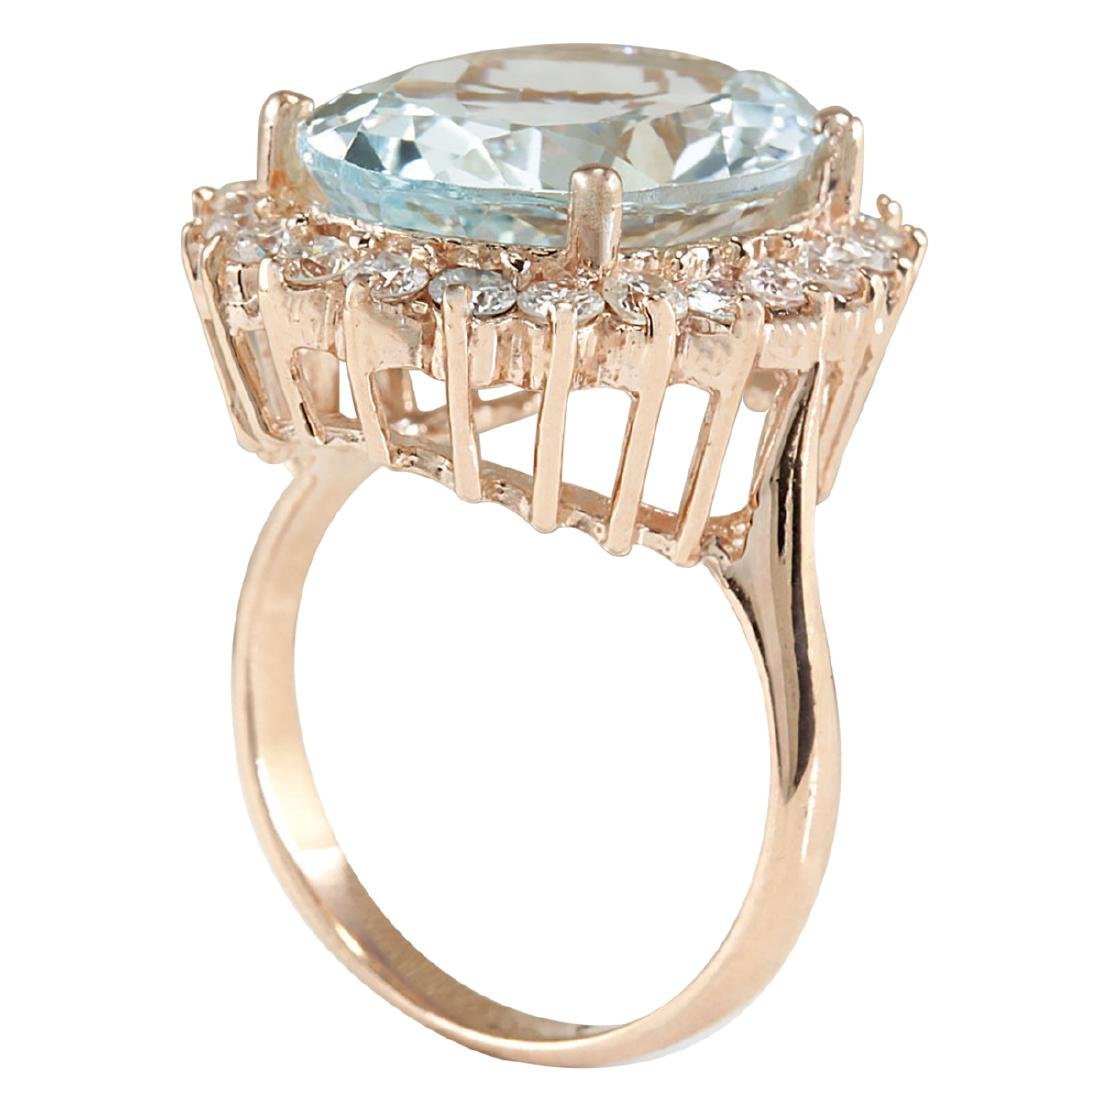 8.40CTW Natural Aquamarine And Diamond Ring In 18K - 3